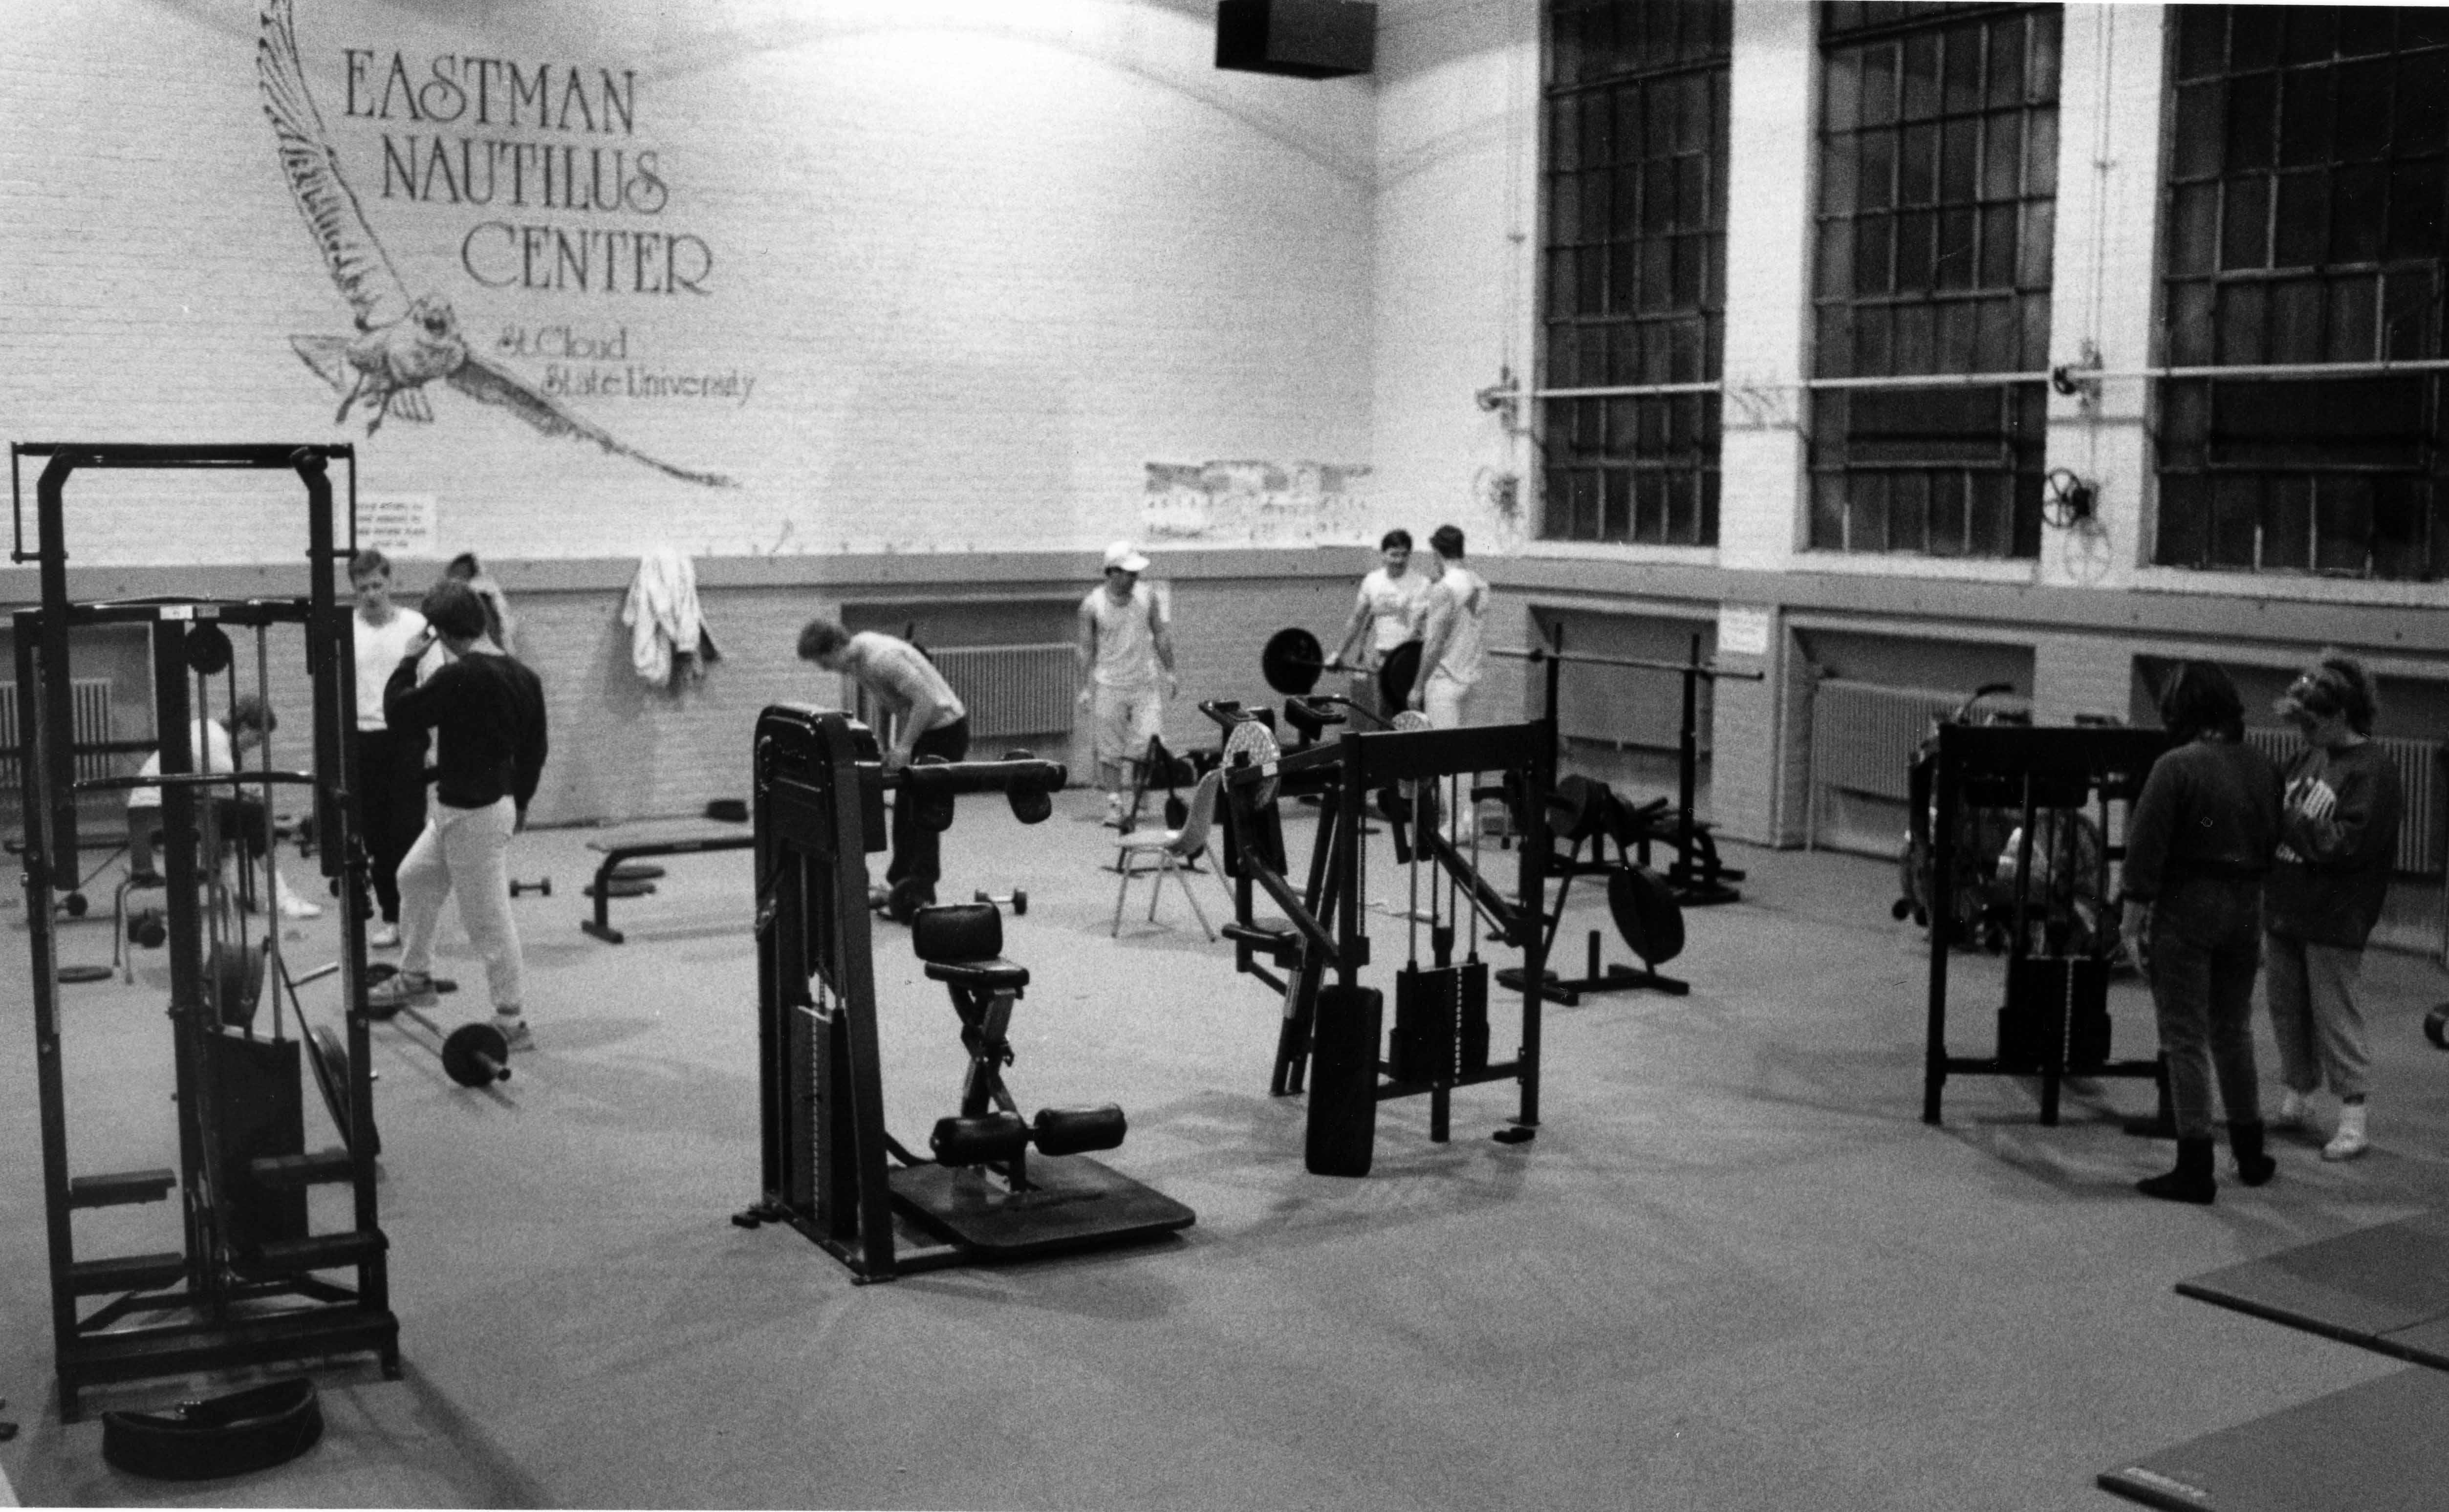 Eastman Hall Nautilus Center, January 1988